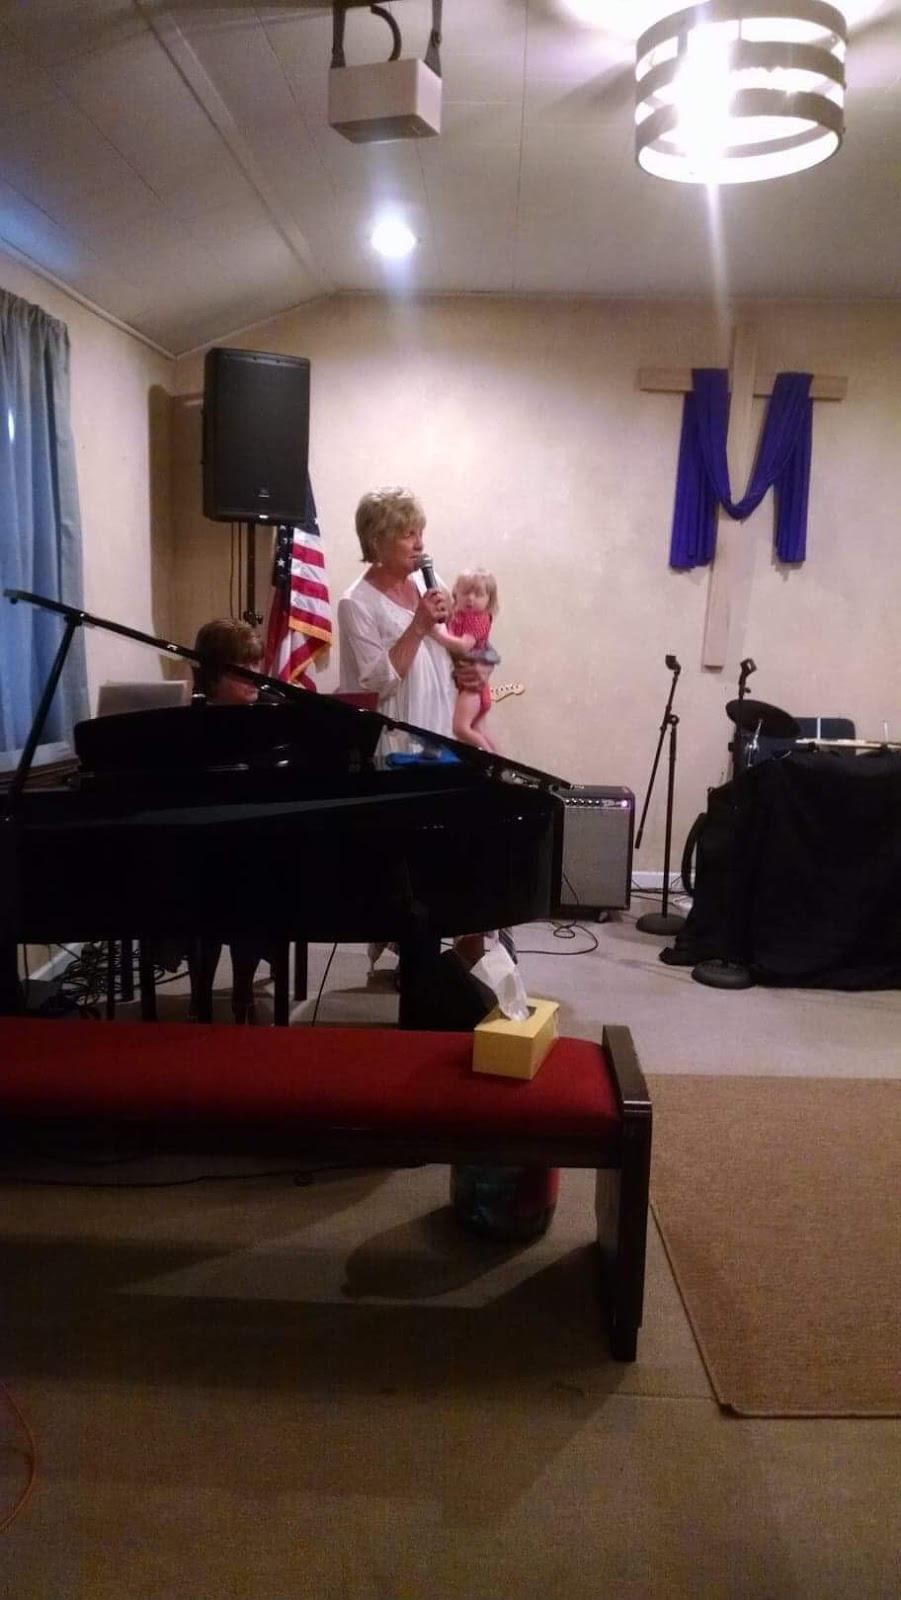 Trinity Full Gospel Ministries - church  | Photo 4 of 9 | Address: 3953 Casa Blvd, Grove City, OH 43123, USA | Phone: (614) 584-0915